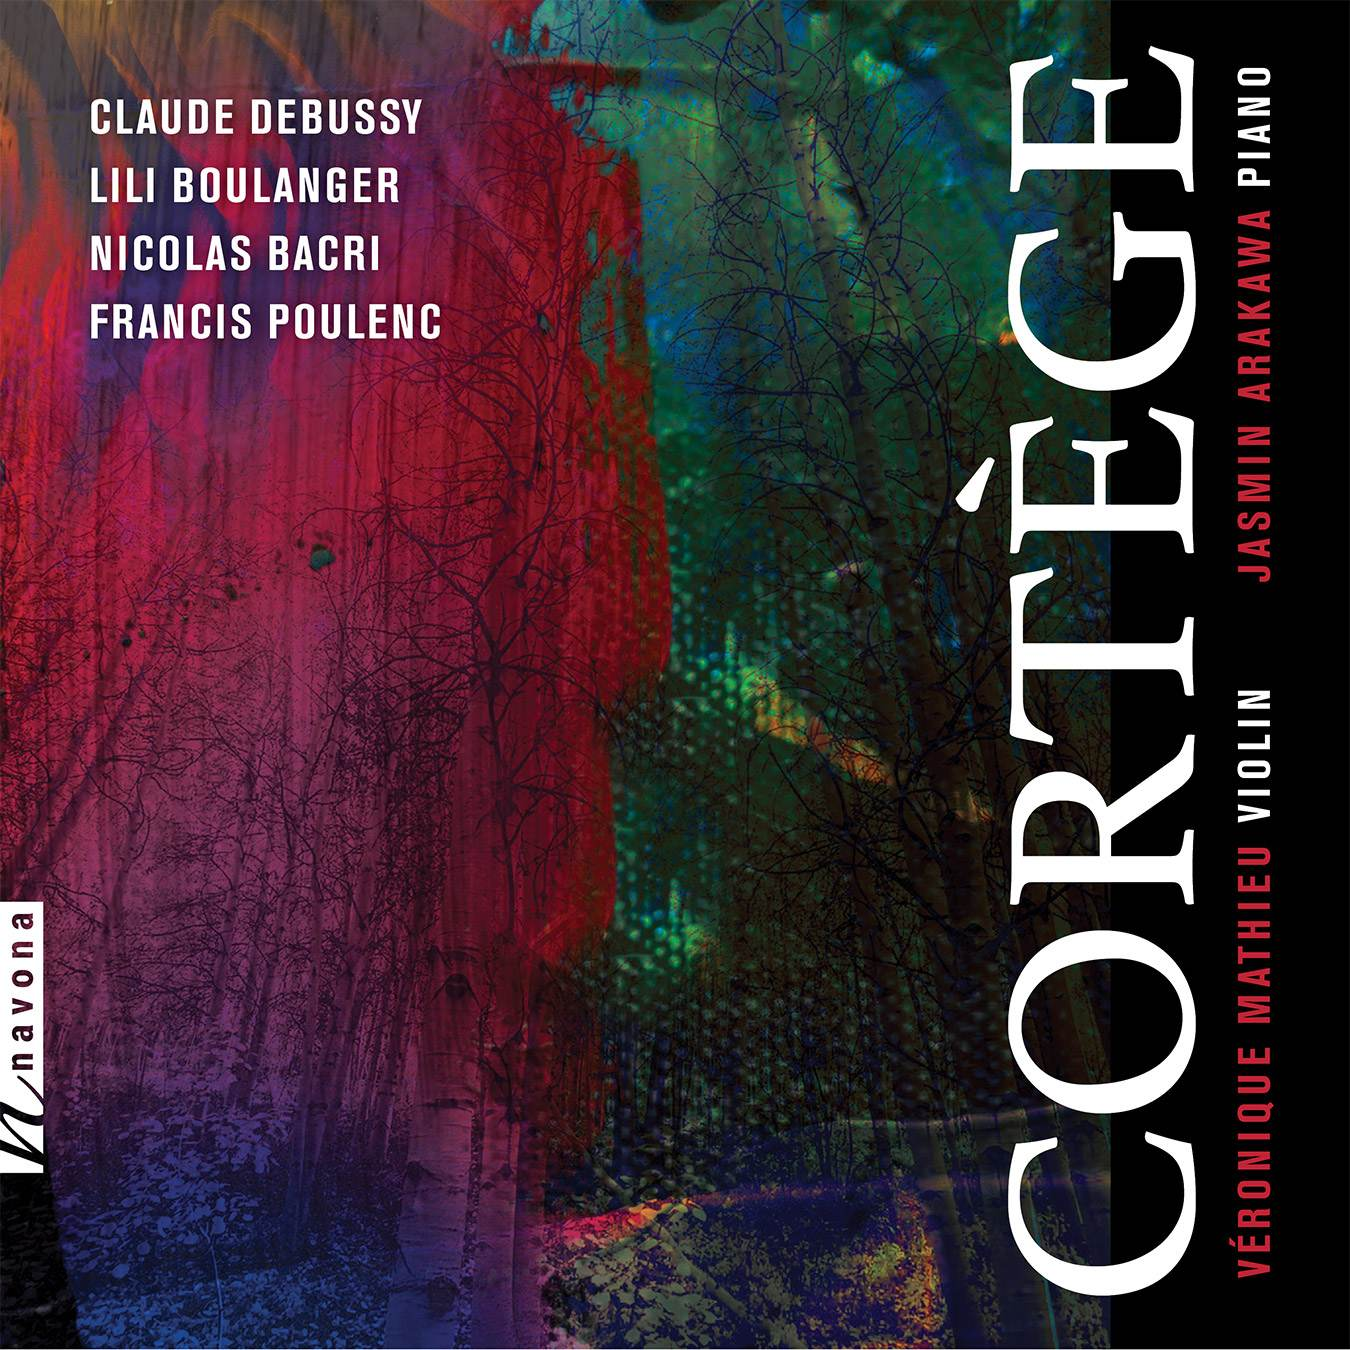 CORTÈGE- Véronique Mathieu and Jasmin Arakawa - Album Cover